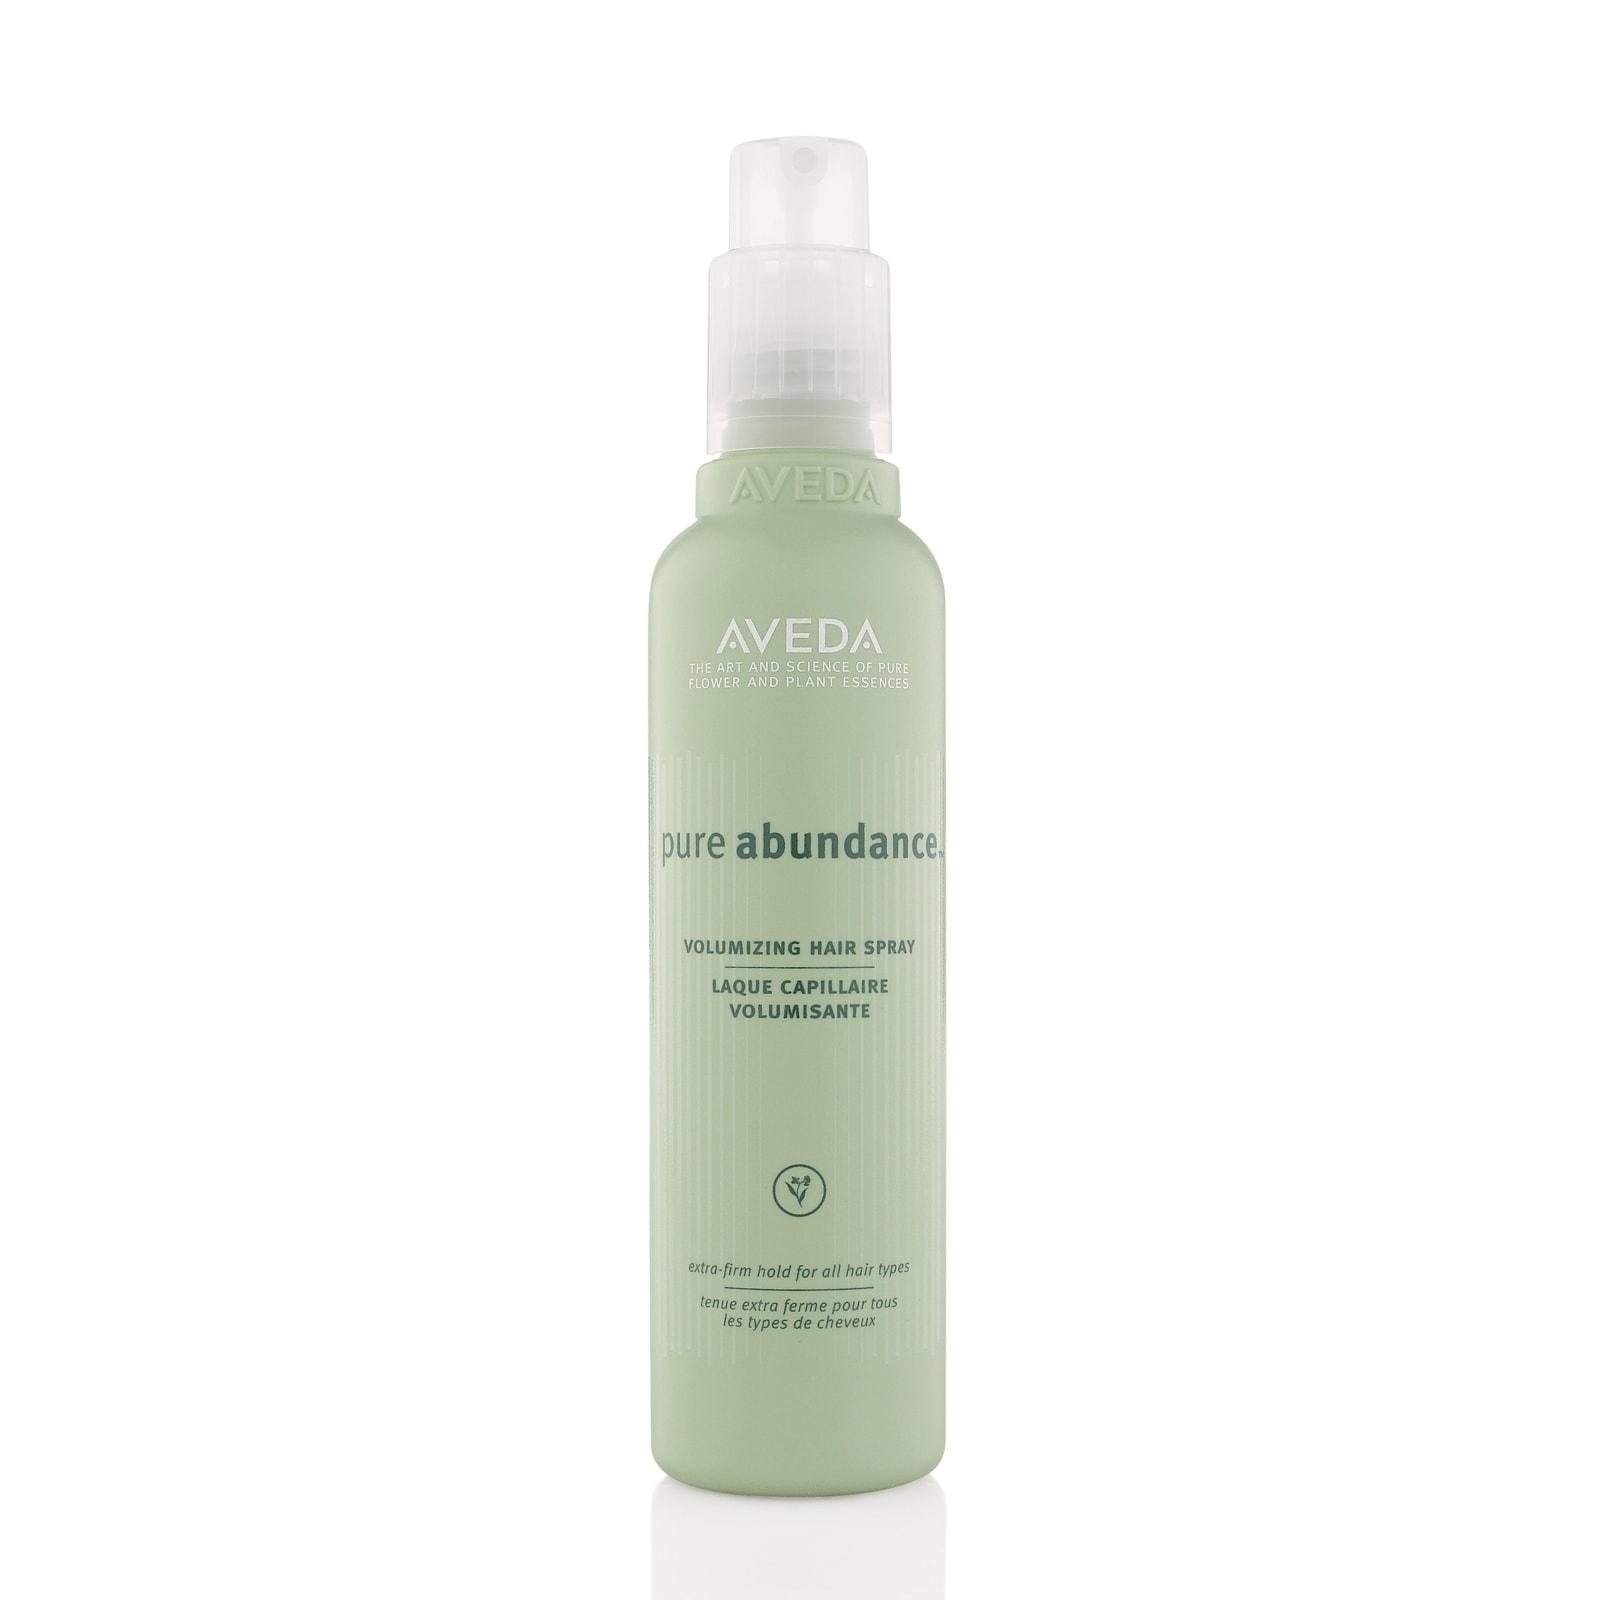 Aveda Pure Abundance Volumizing 6.7-ounce Hair Spray, Blu...